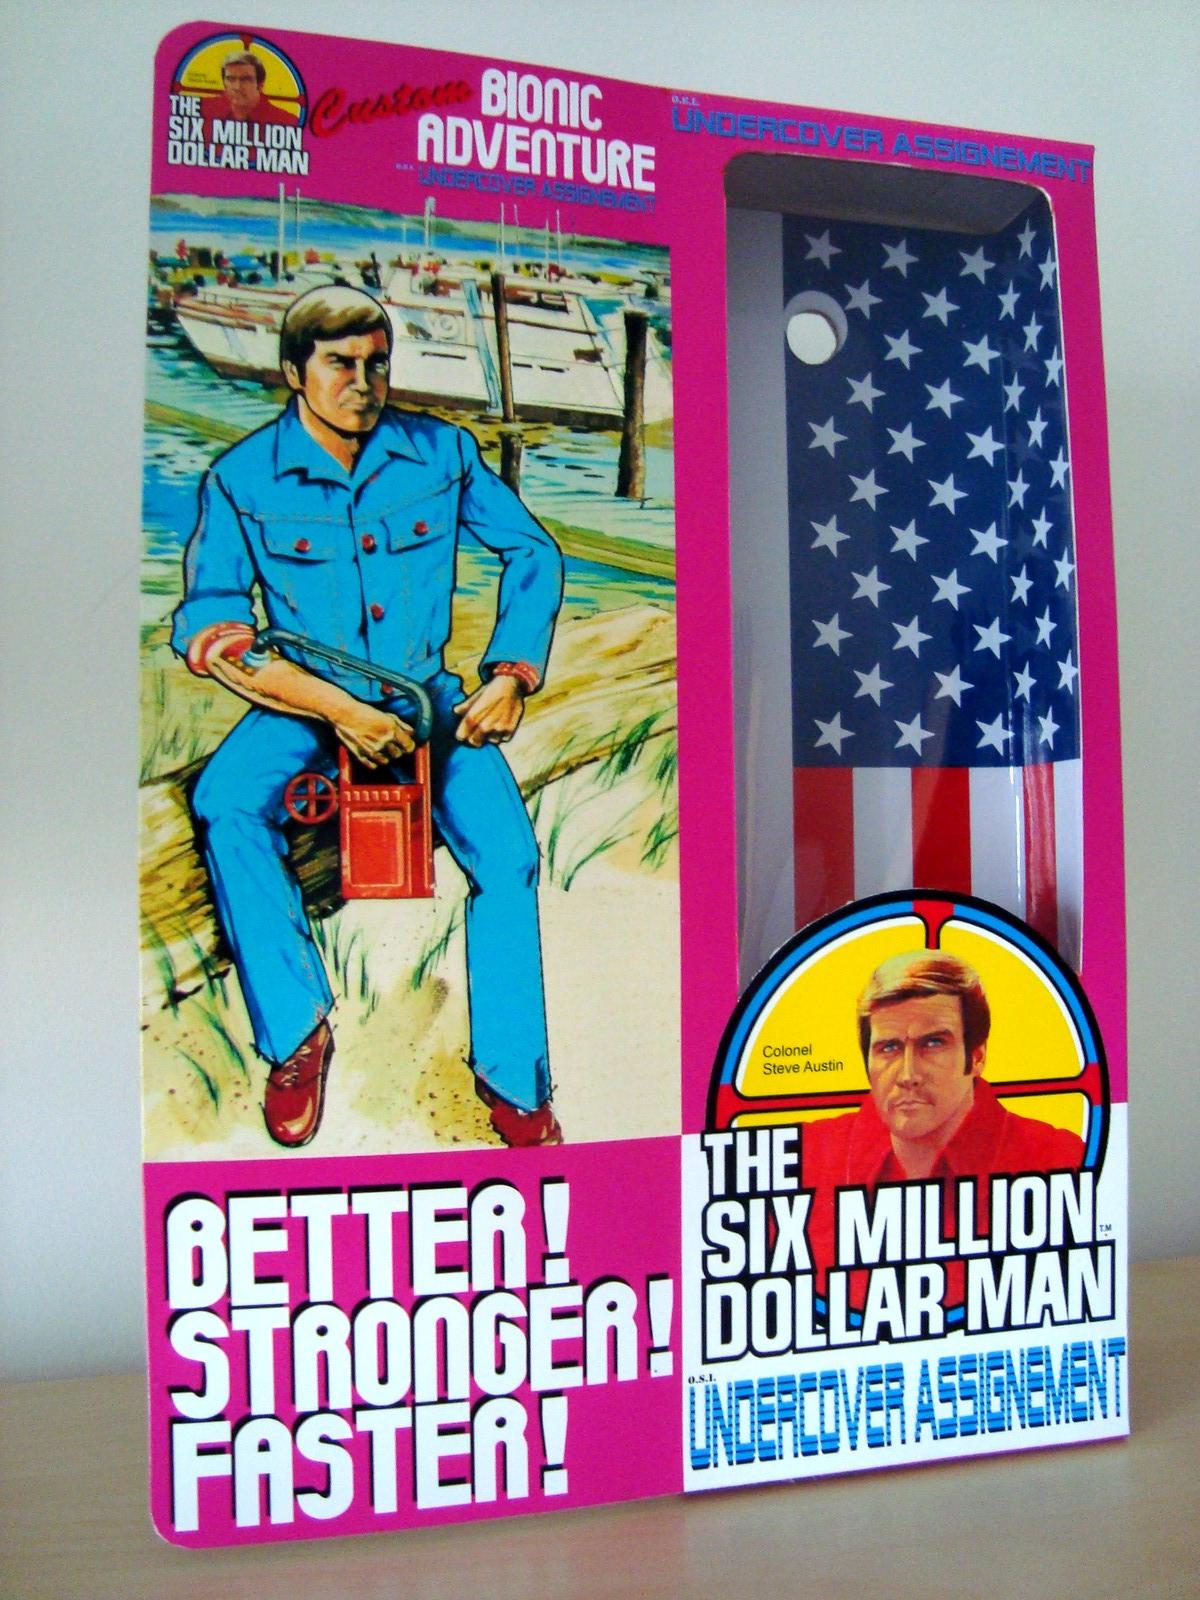 Steve Austin L'homme qui valait 3 milliards - KENNER MECCANO - Page 11 17062907124053935